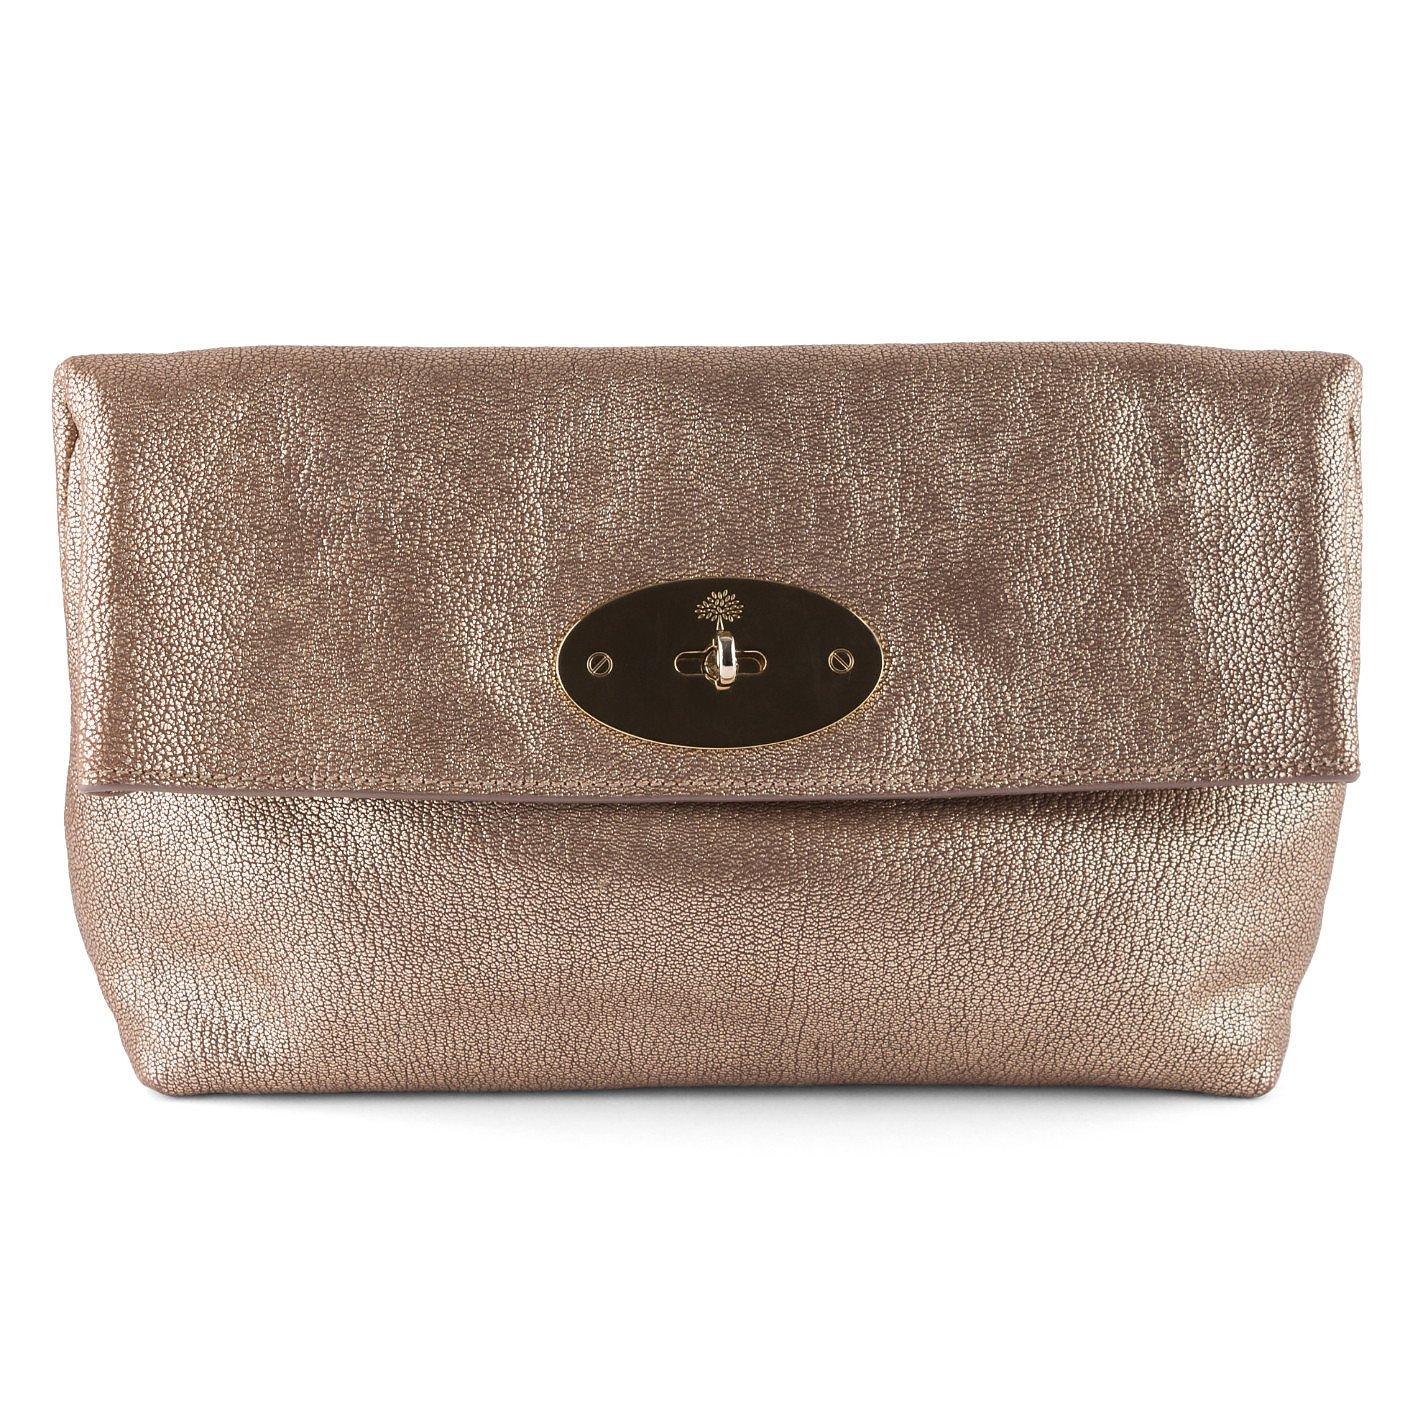 Mulberry Metallic Textured Clutch Bag